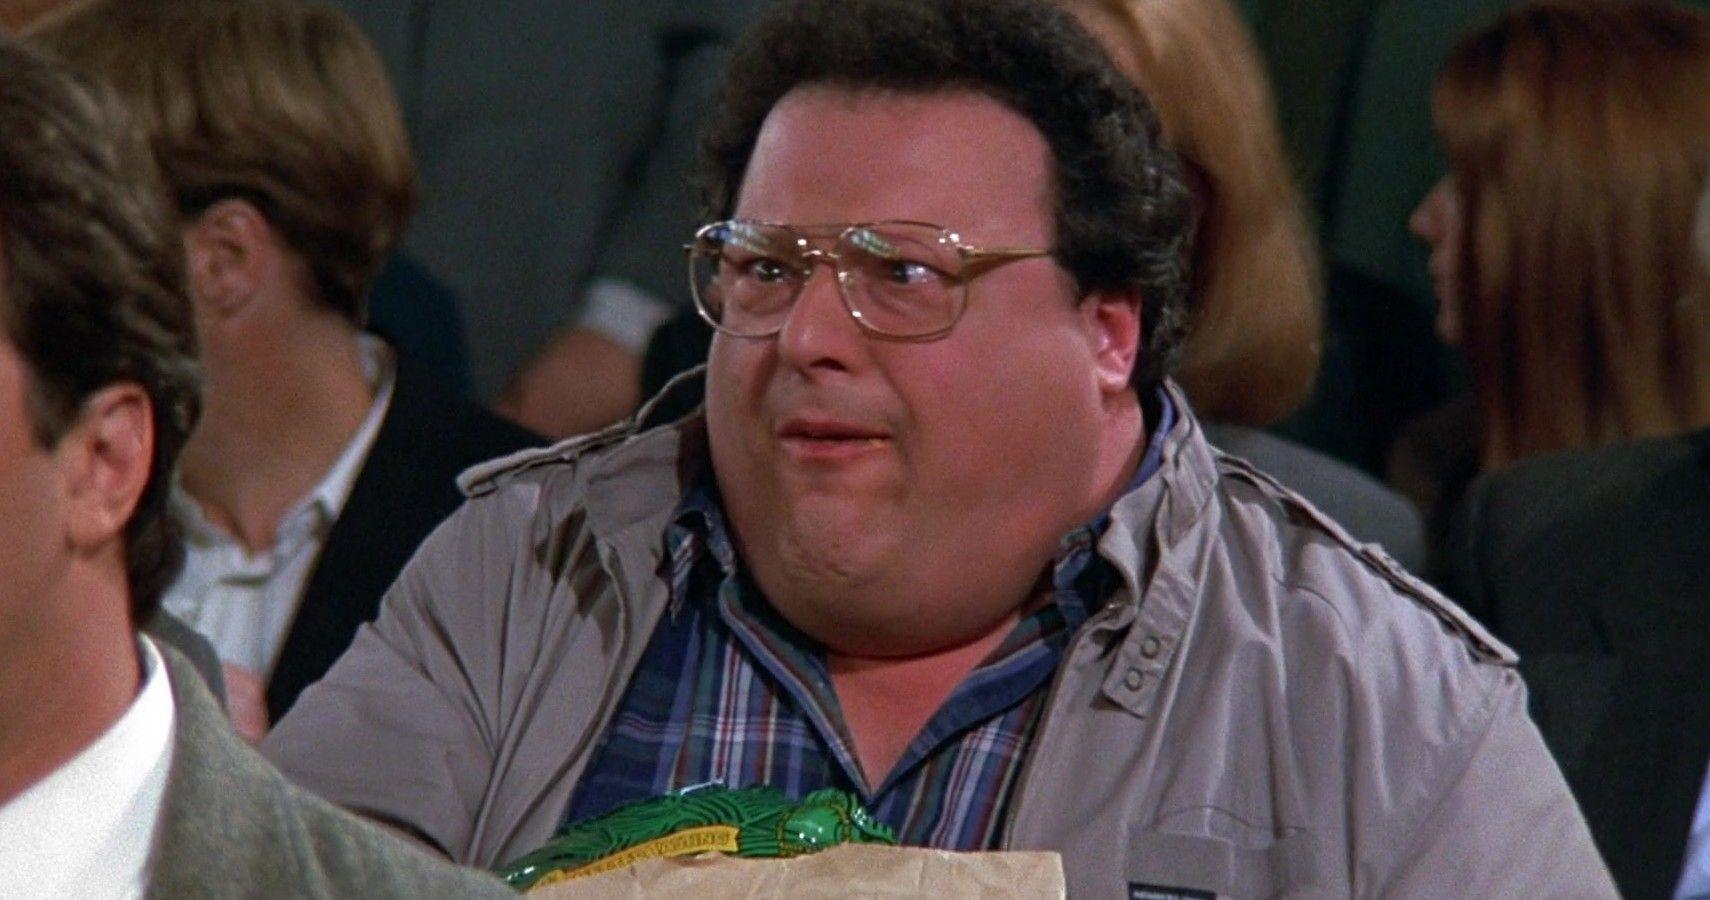 newman svorio netekimas Seinfeld)